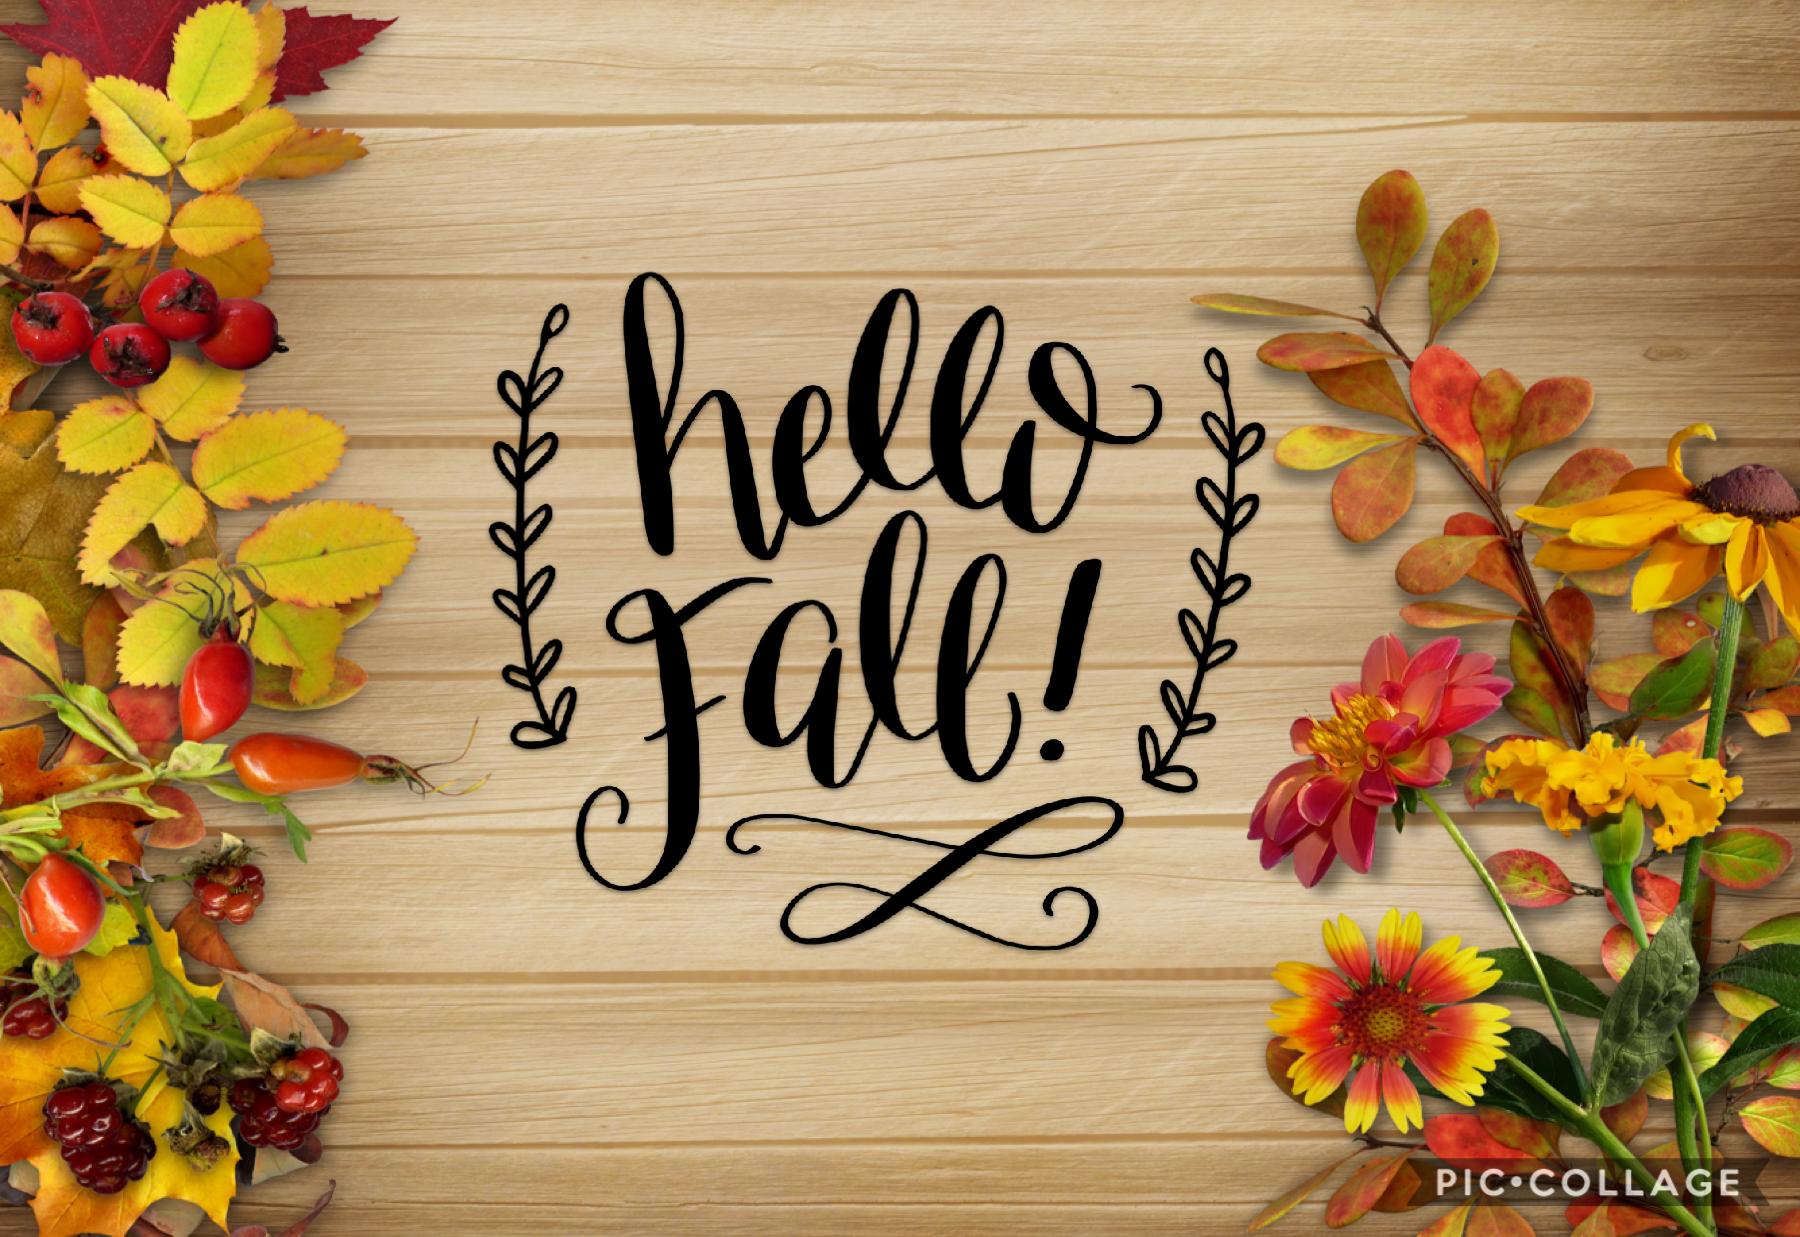 It's finally Fall!!!!